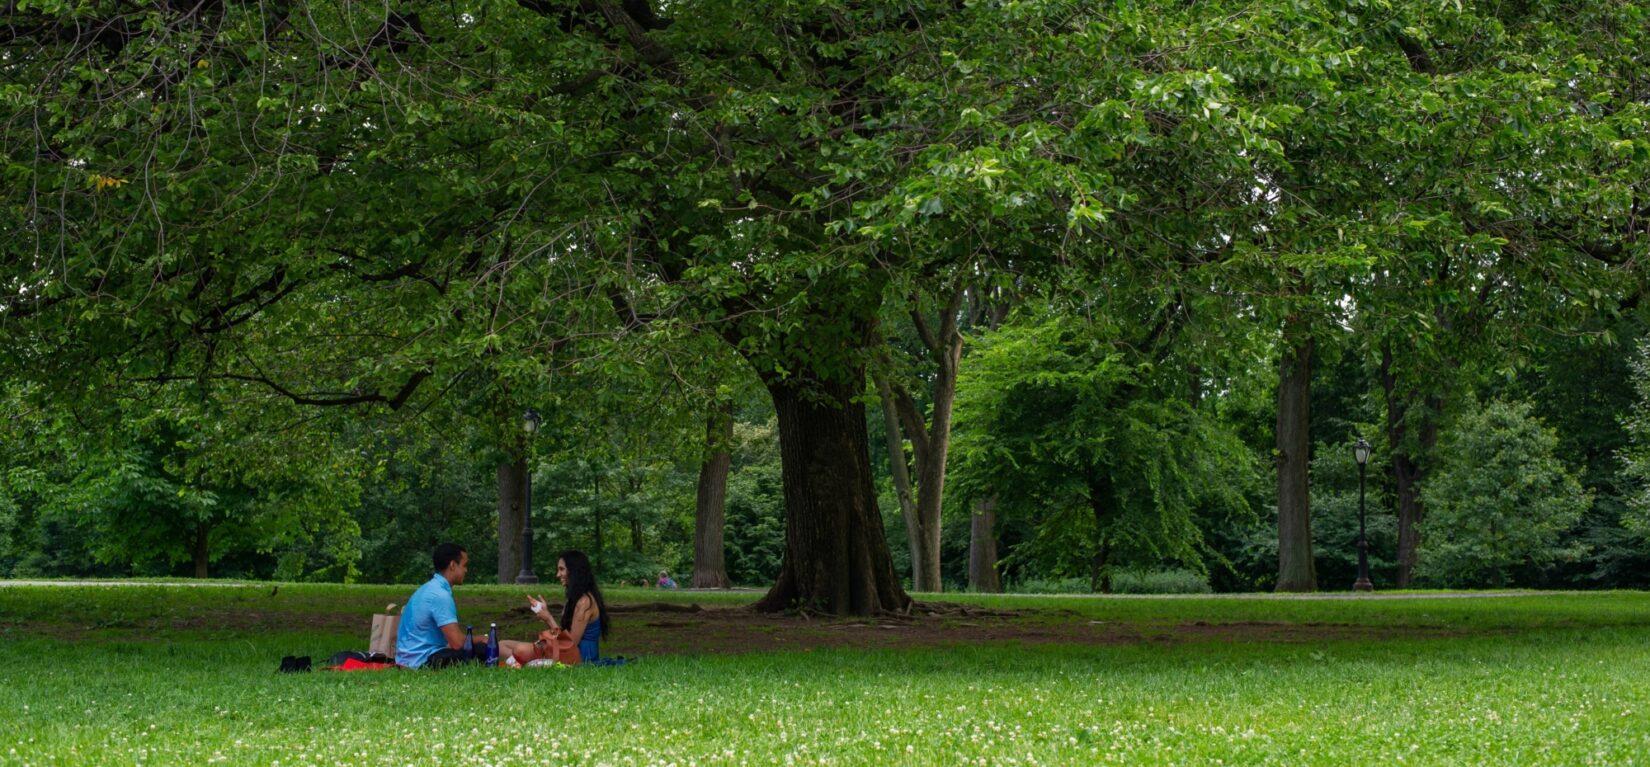 A couple picnics beneath the broad canopy of a leafy tree.